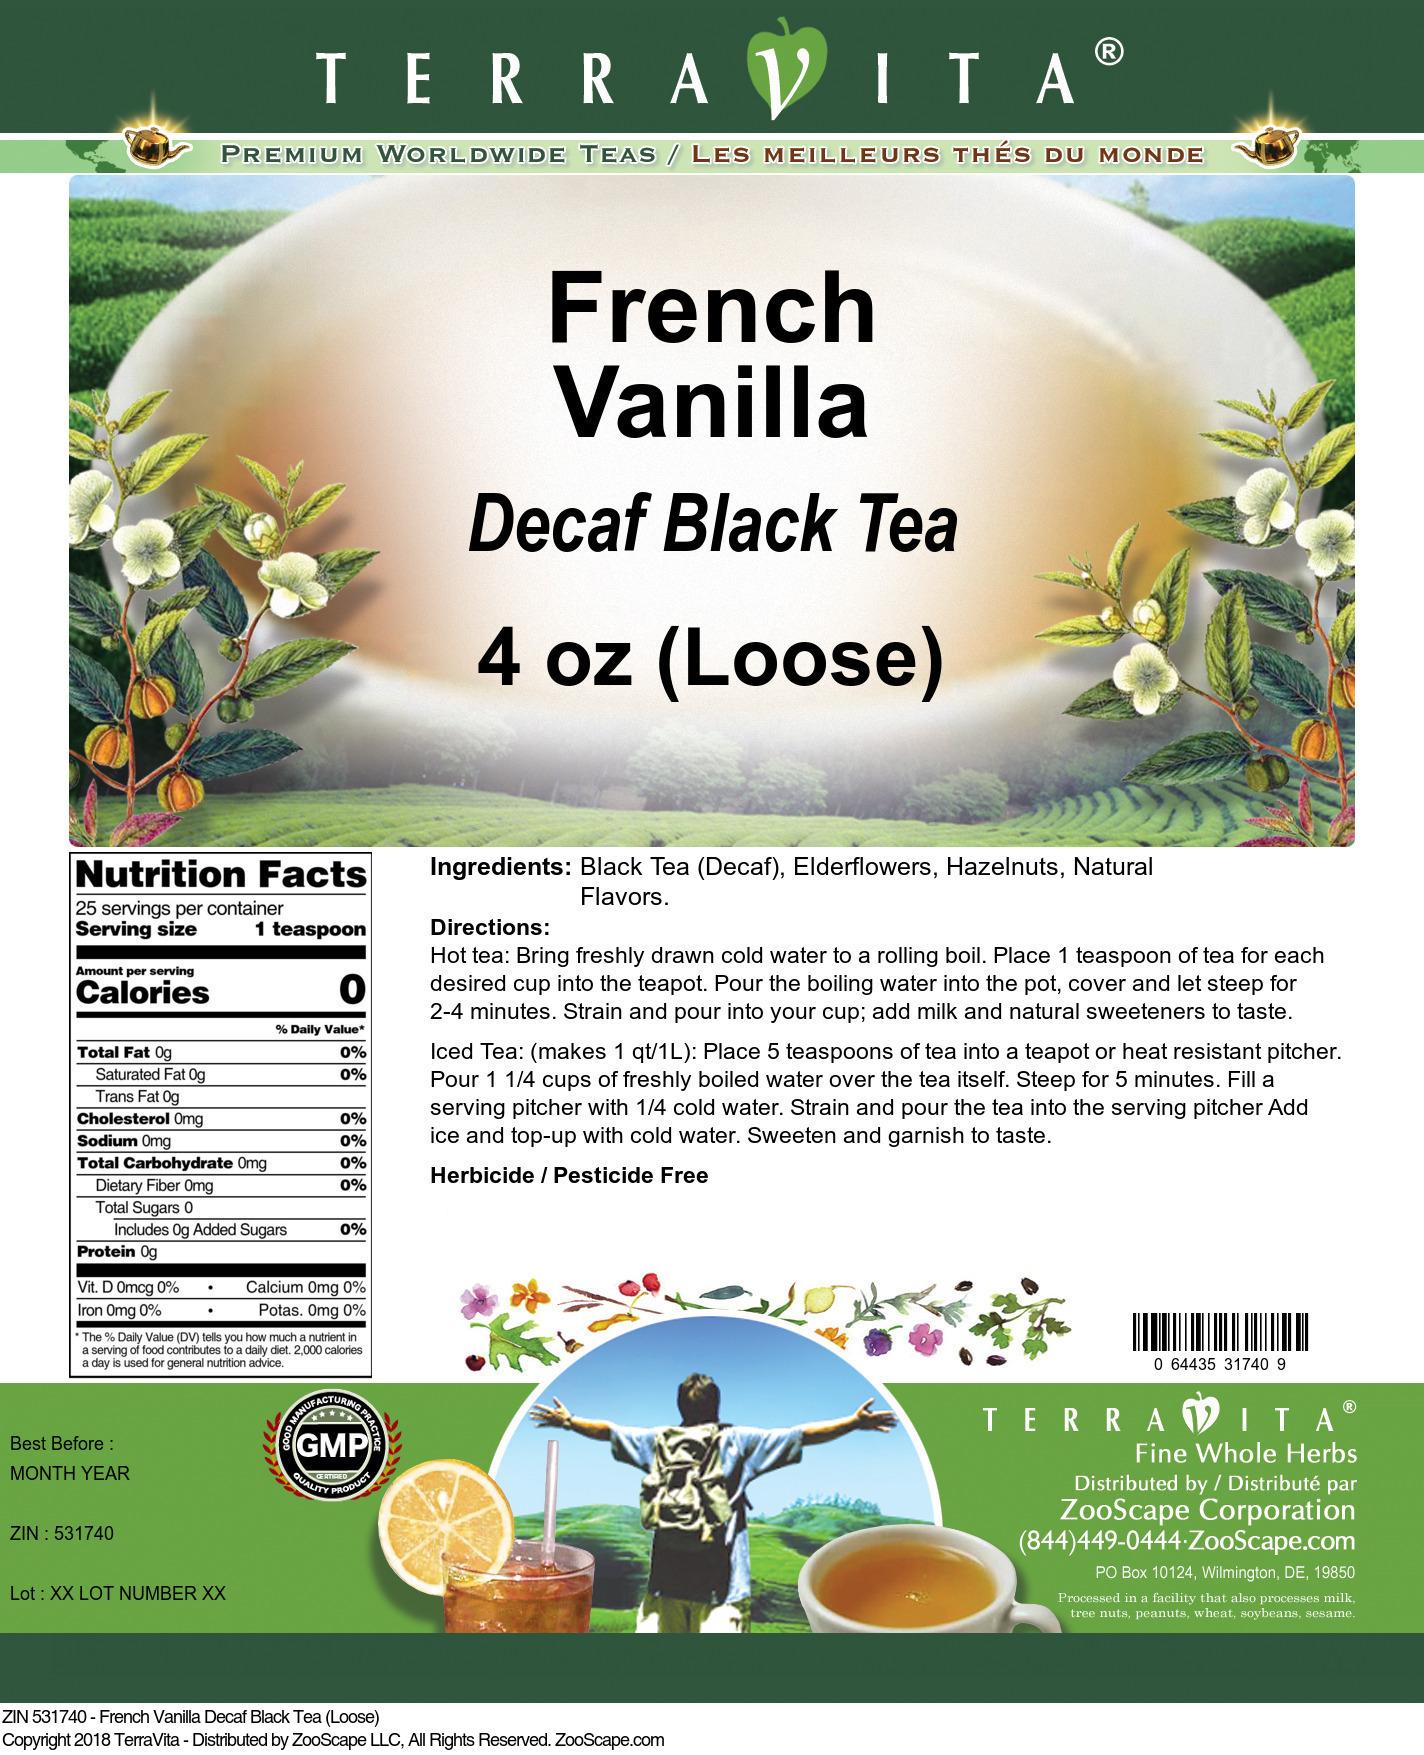 French Vanilla Decaf Black Tea (Loose)